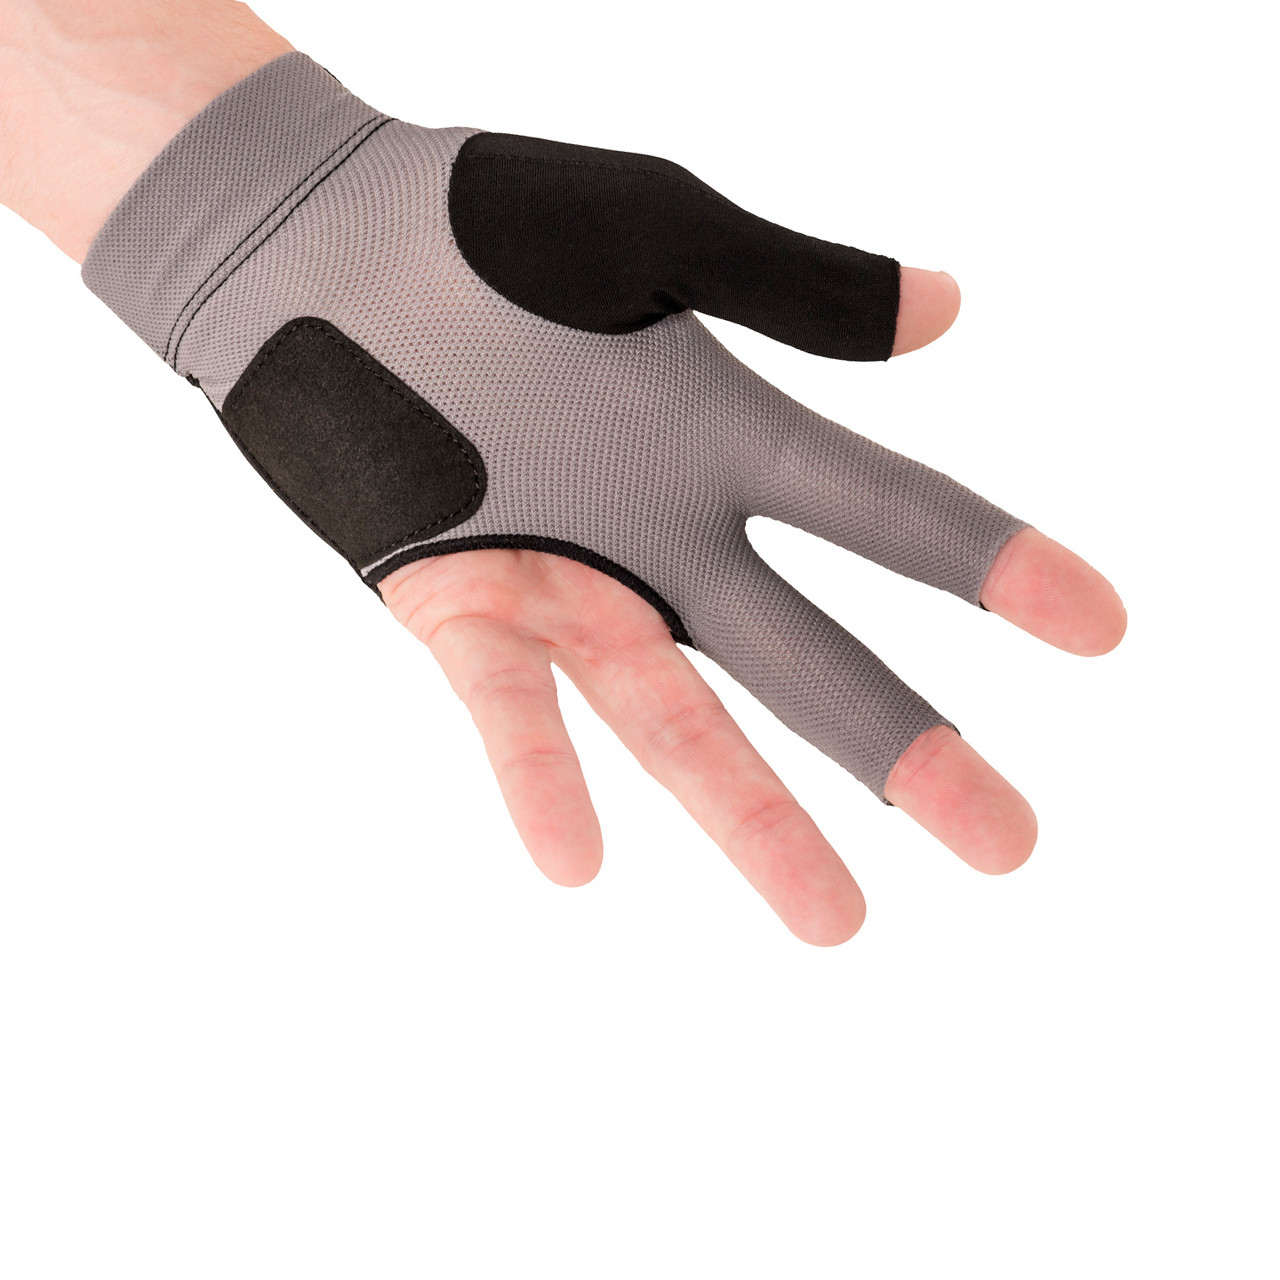 Predator Second Skin Pool Glove - Palm